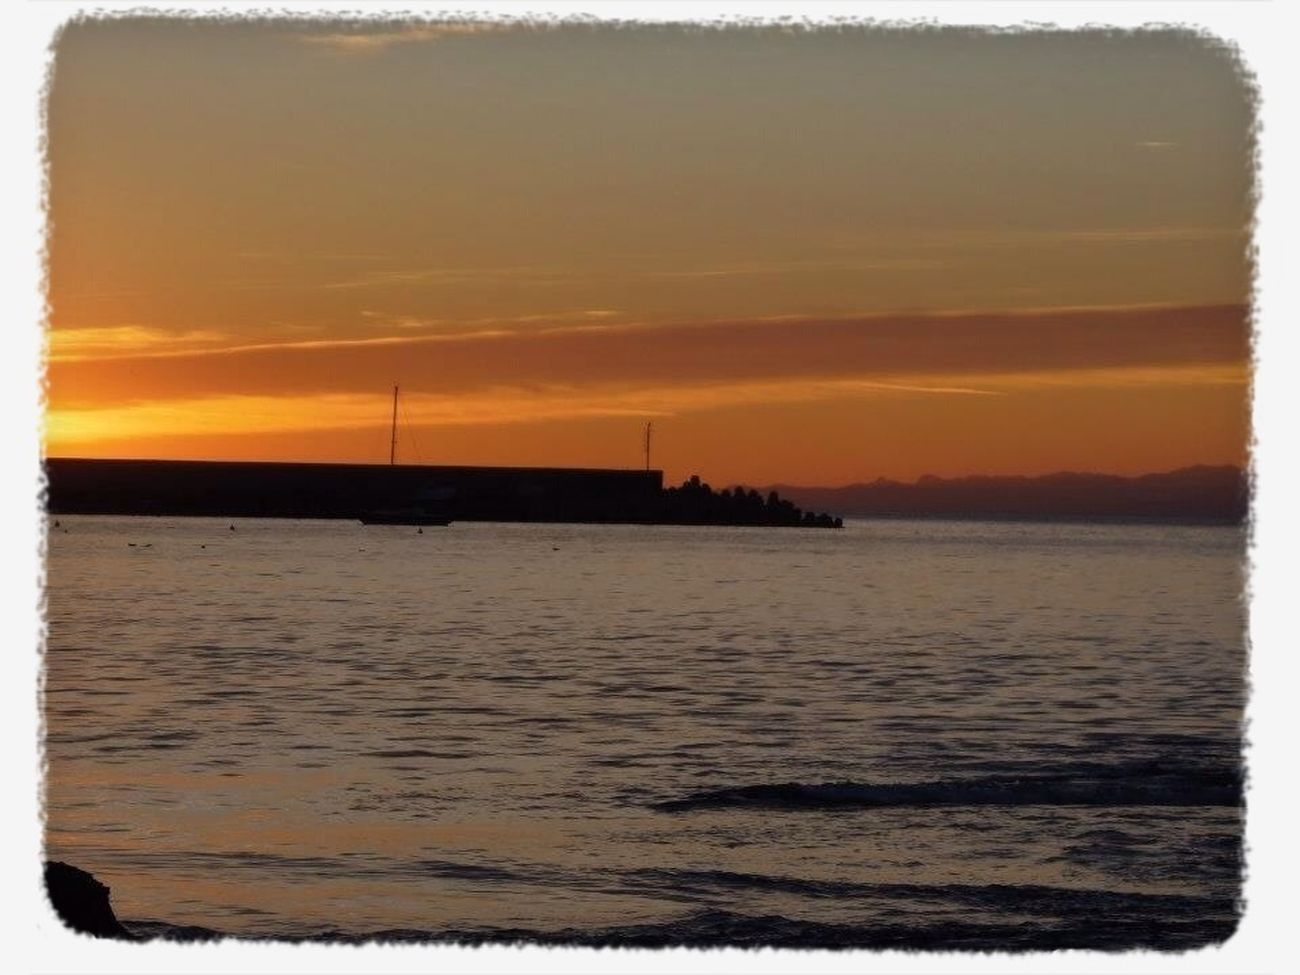 Sunset_in_liguria